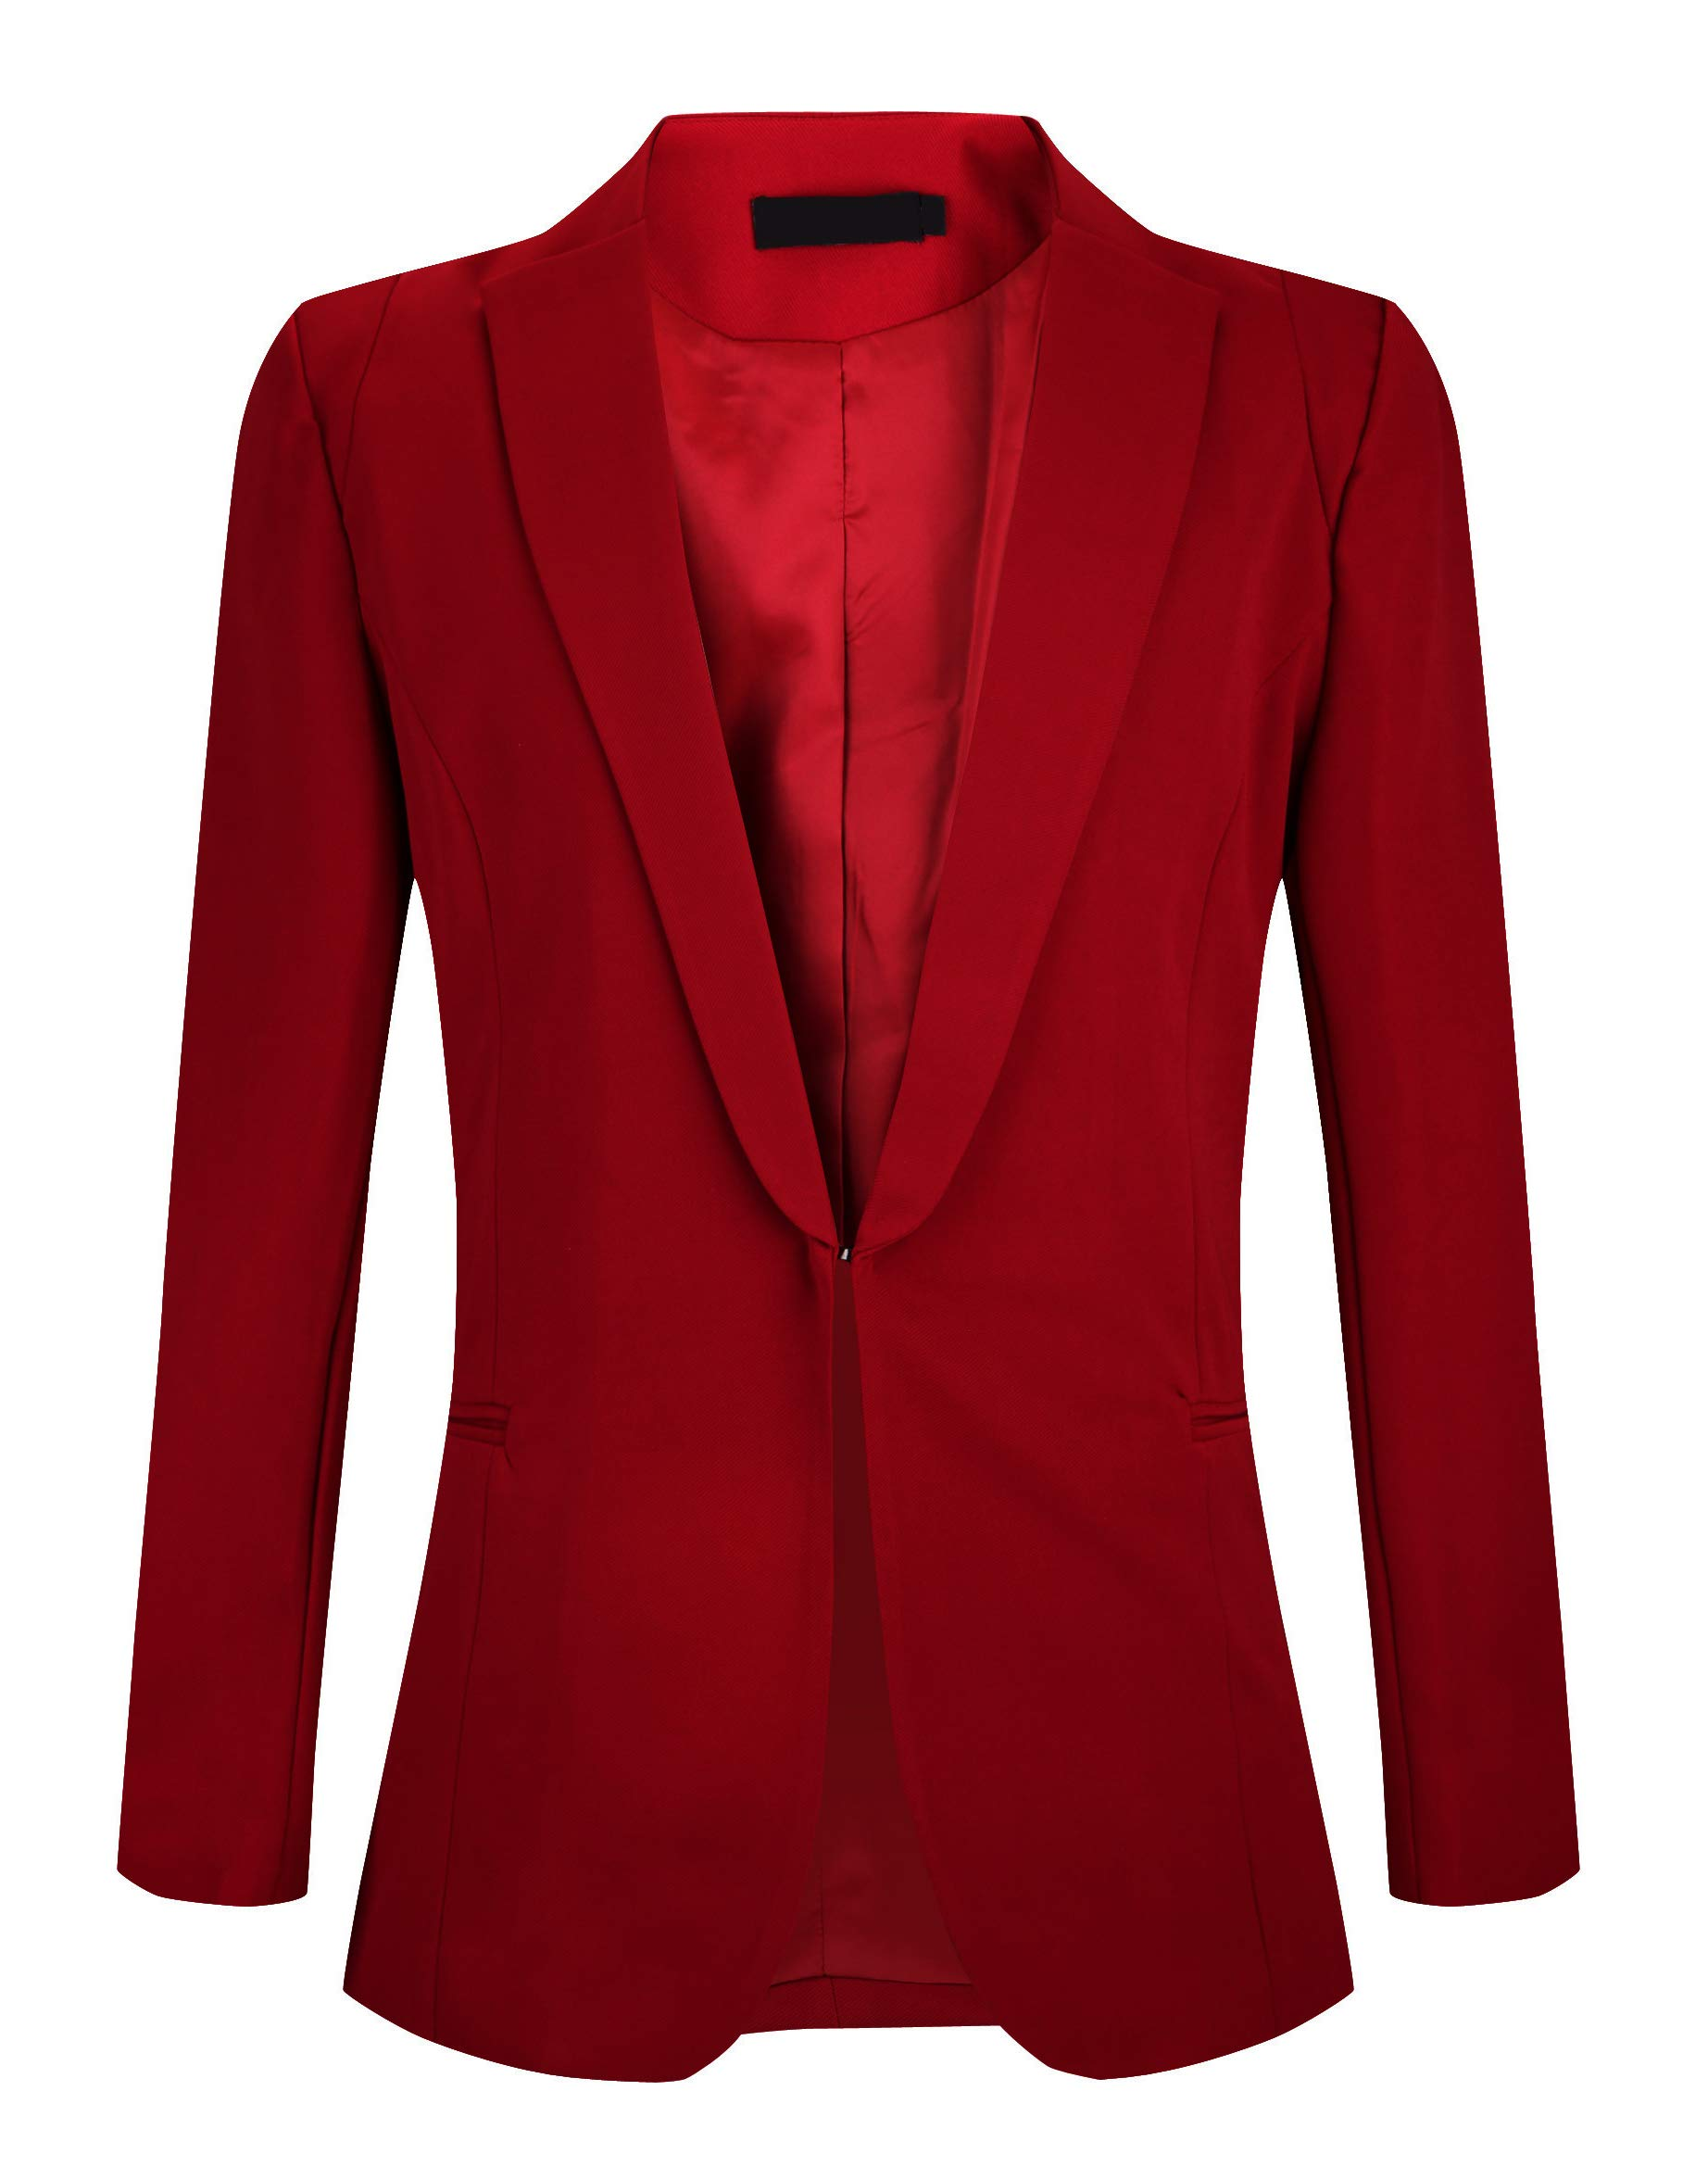 SHUIANGRAN Women's Juniors Work Office Blazer Long Slim Fit Blazers Business Jacket Wine Red US 10 (tag Asian 3XL)